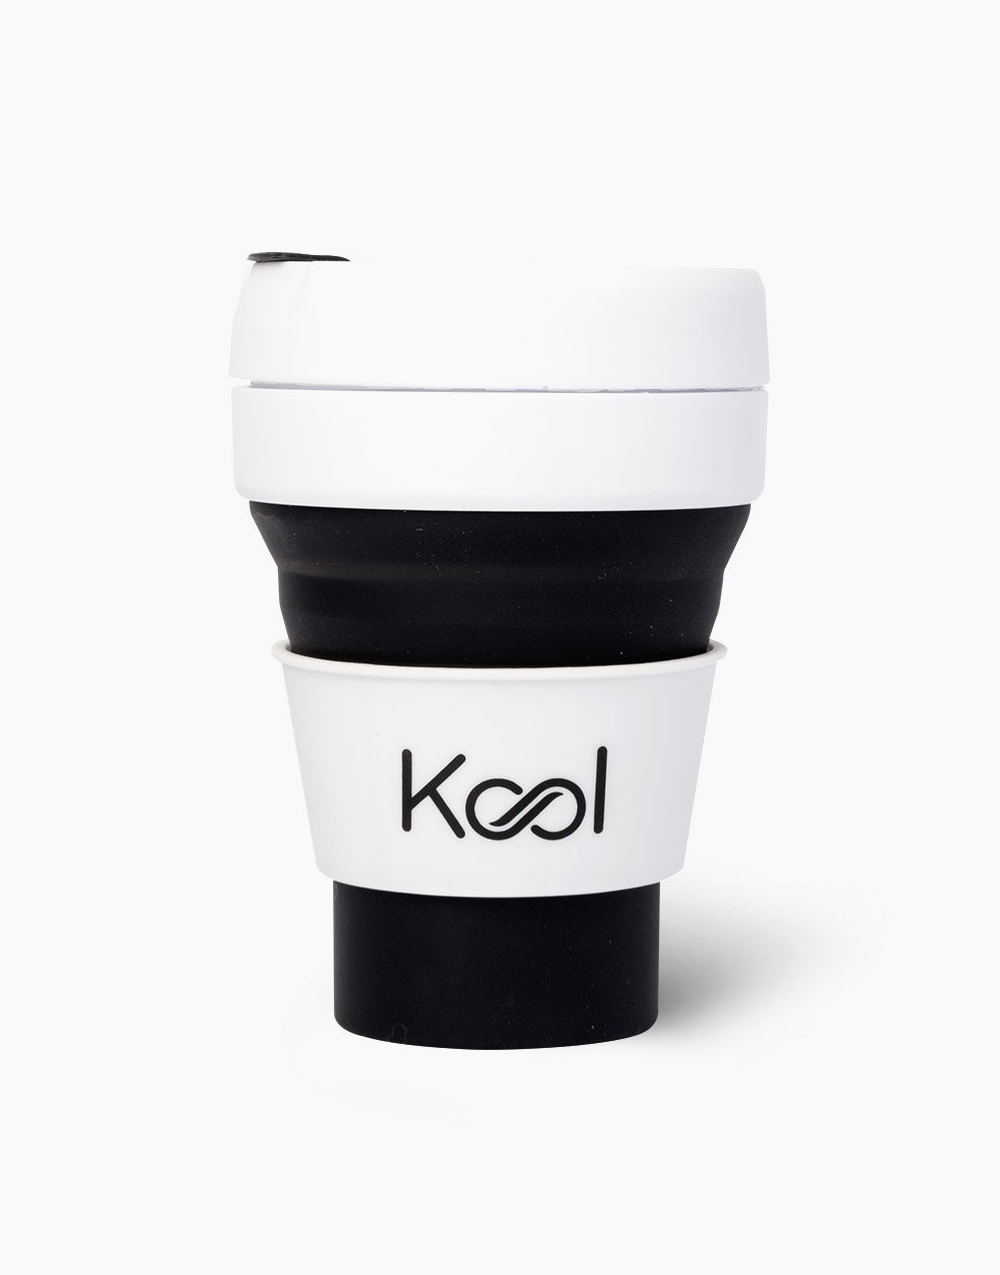 Kool Foldable Cup (355ml) by Kool | Midnight